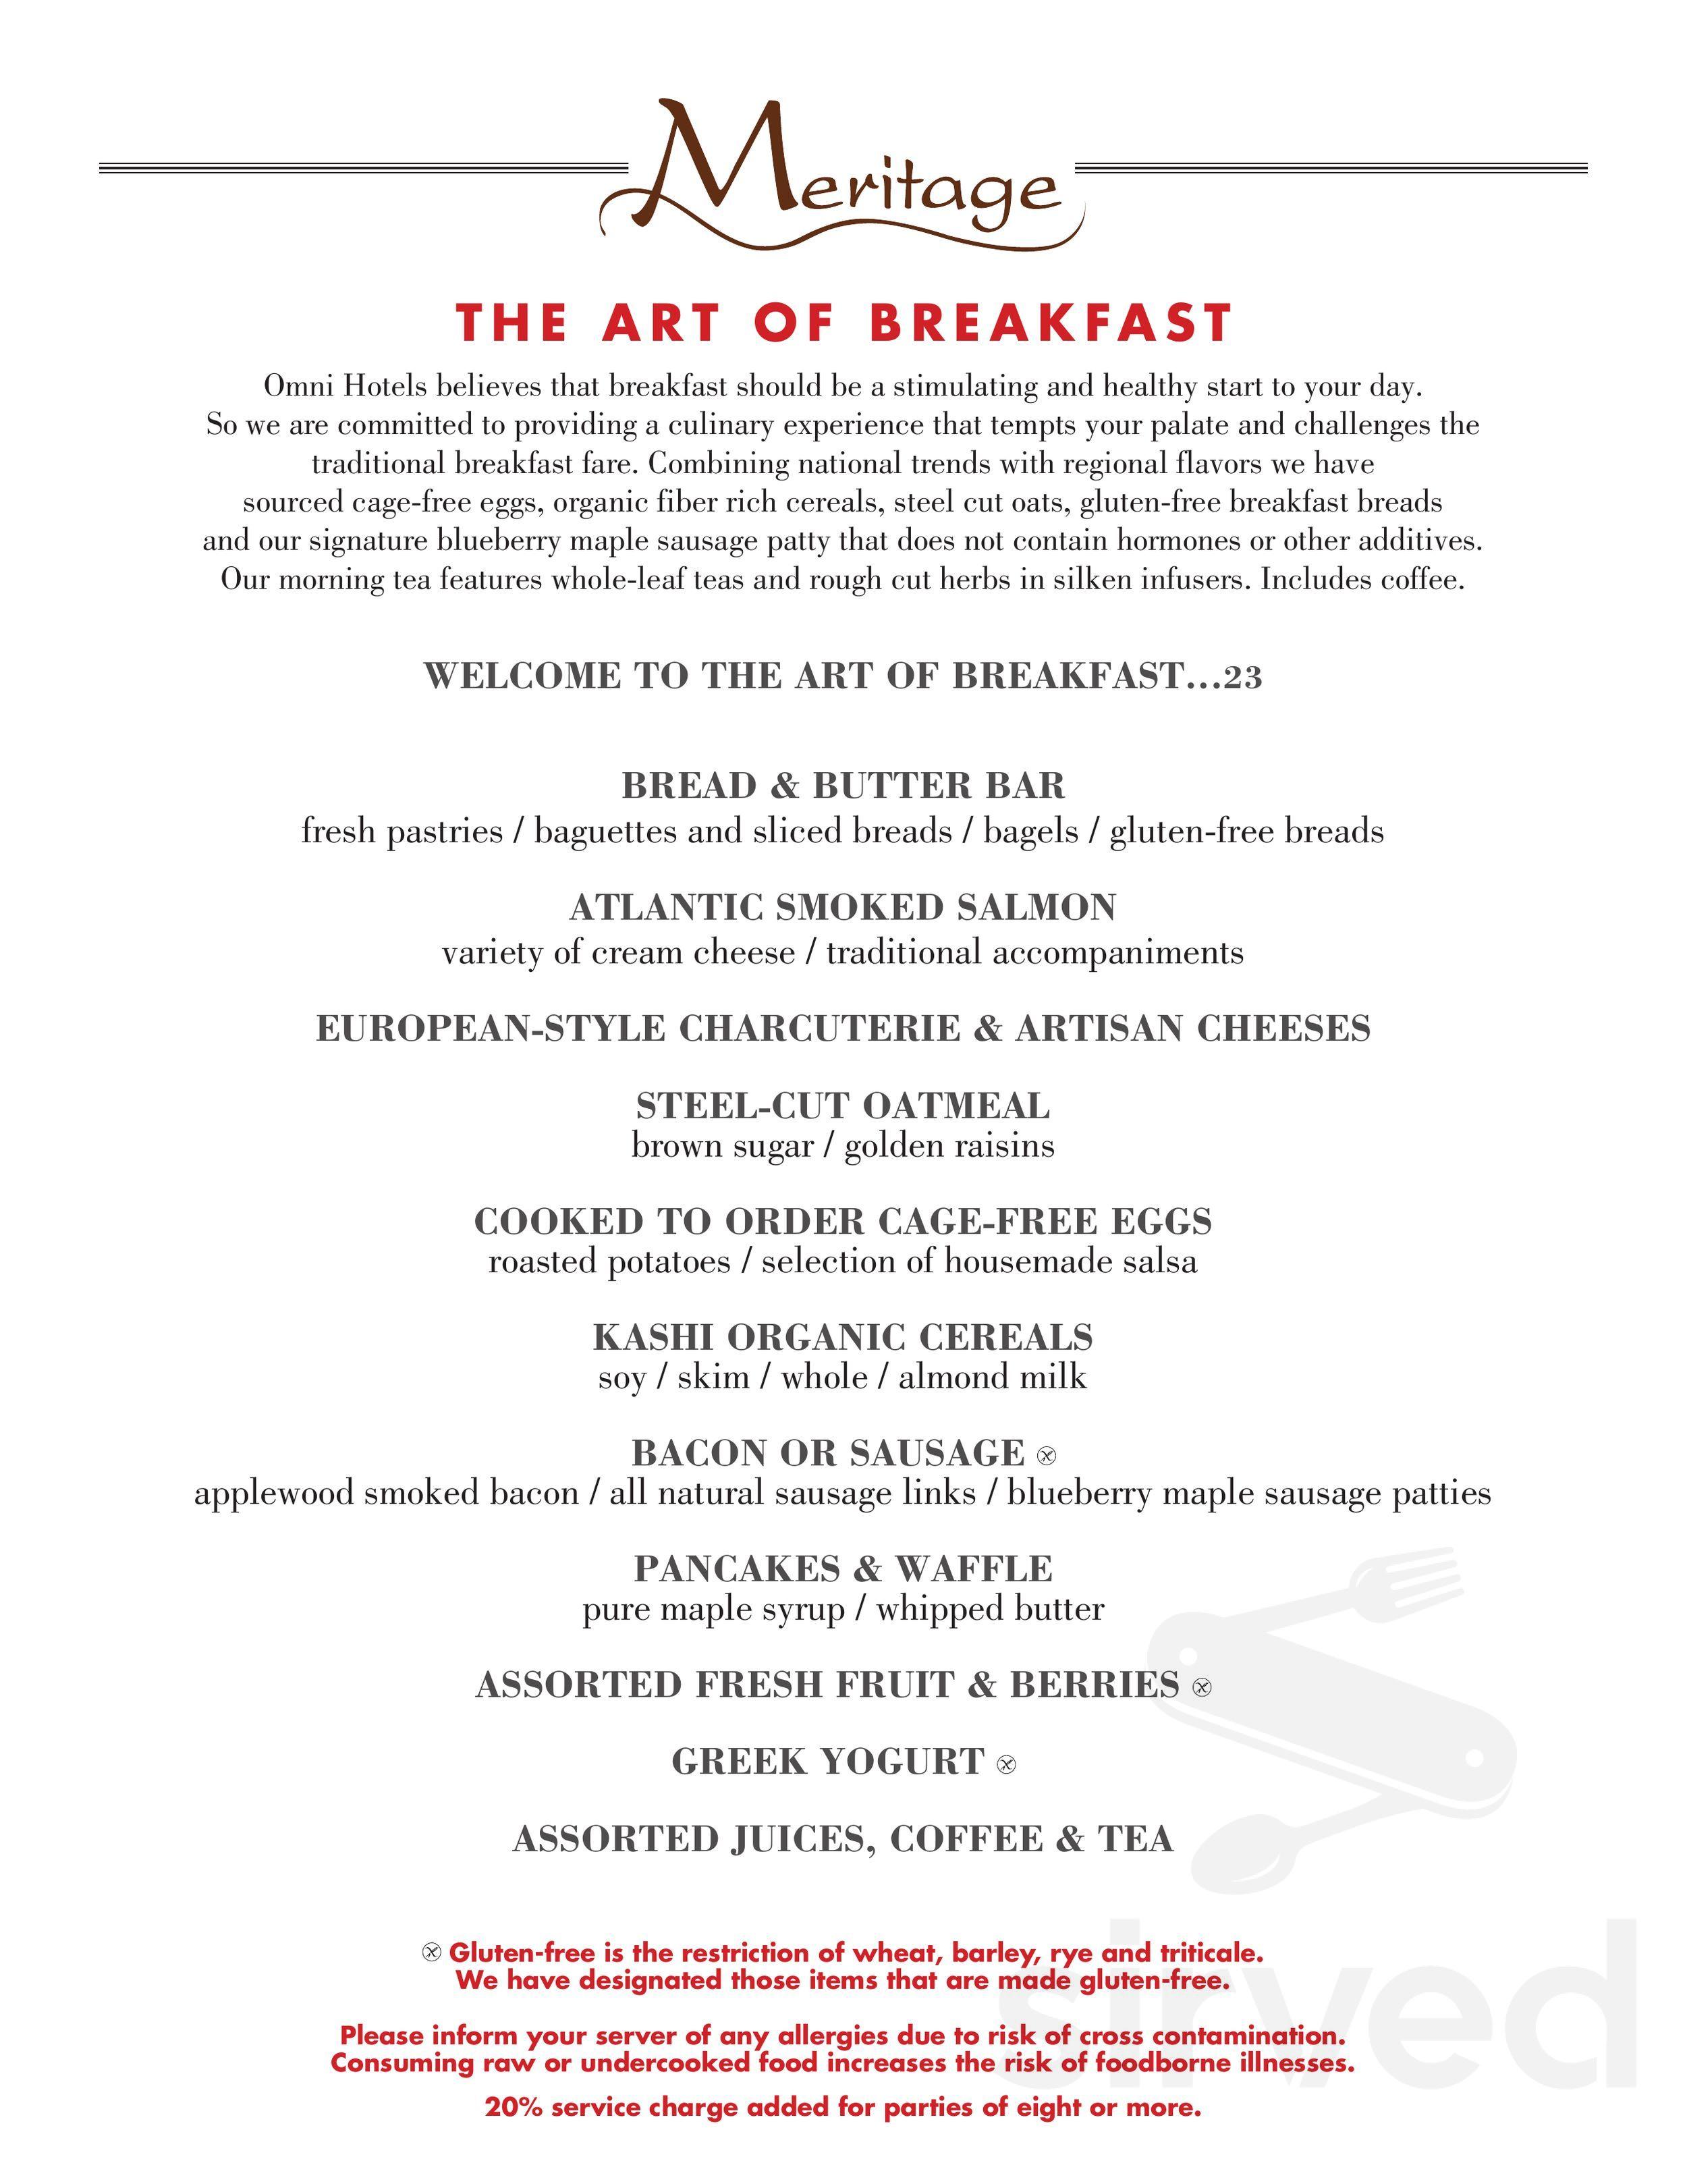 Menu For Meritage Restaurant In Broomfield Colorado Usa